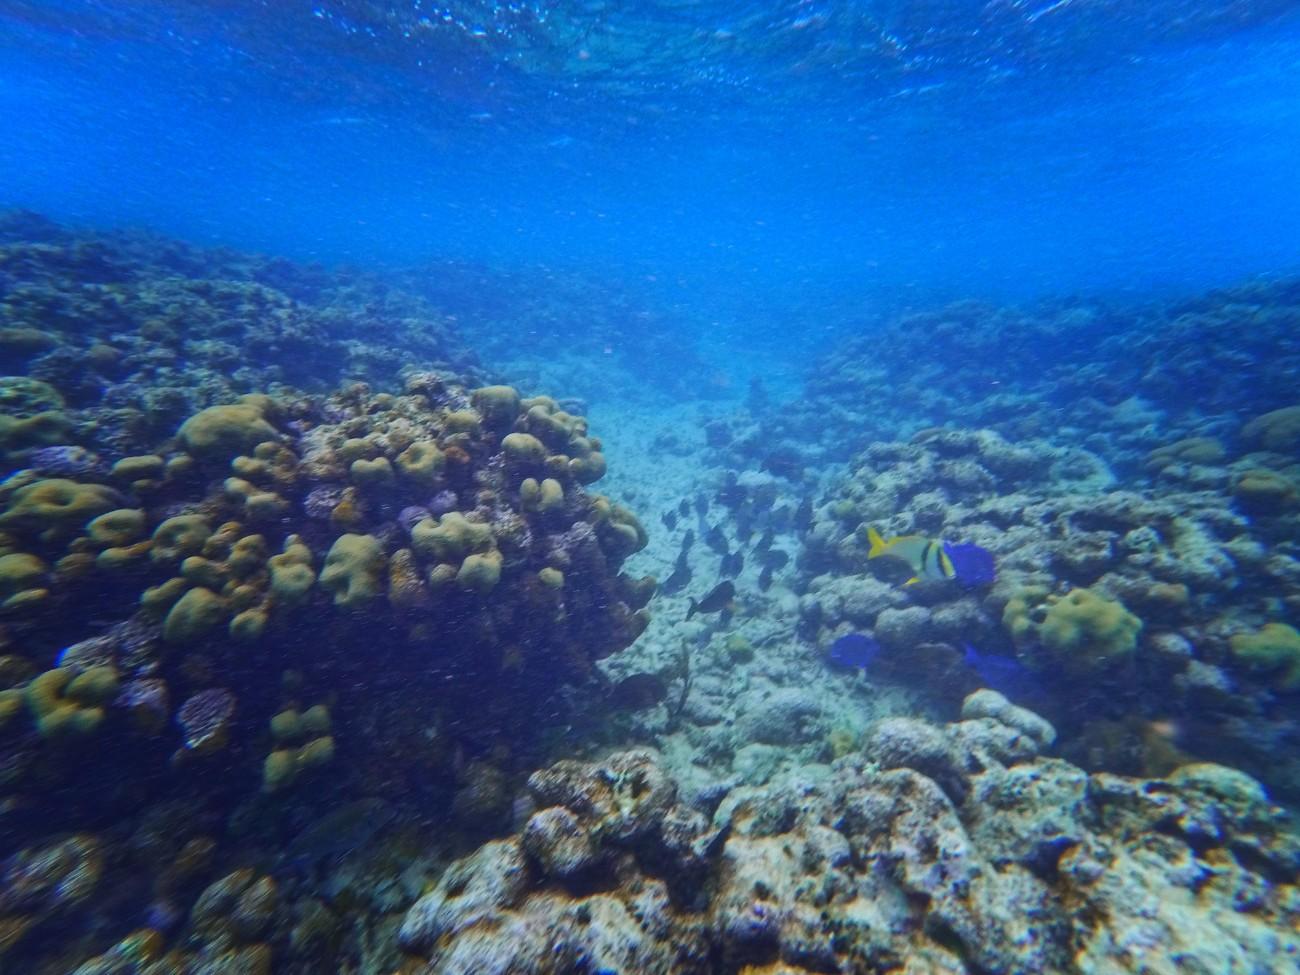 Tropical-fish-snorkeling-Isla-Palominito-Puerto-Rico-2.jpg